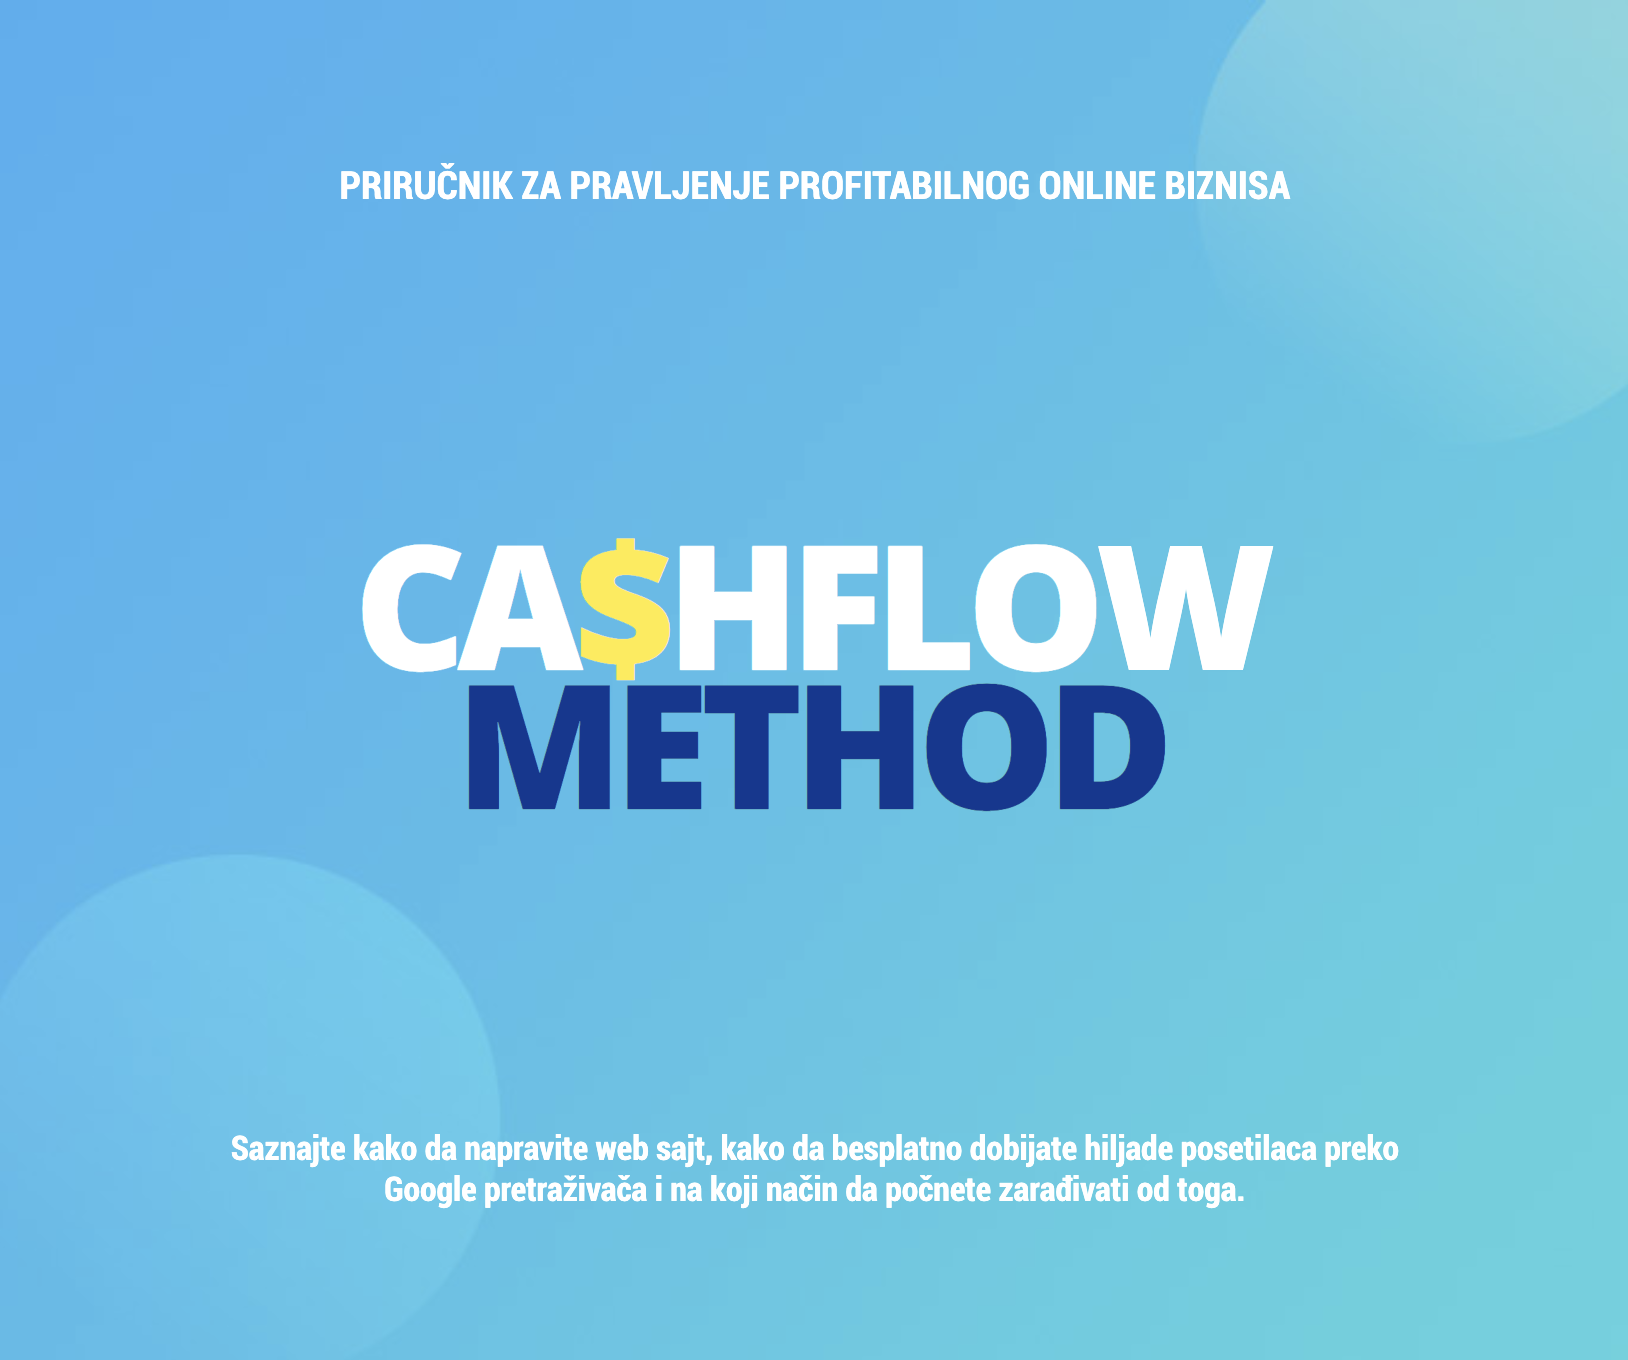 Priručnik CashFlow method